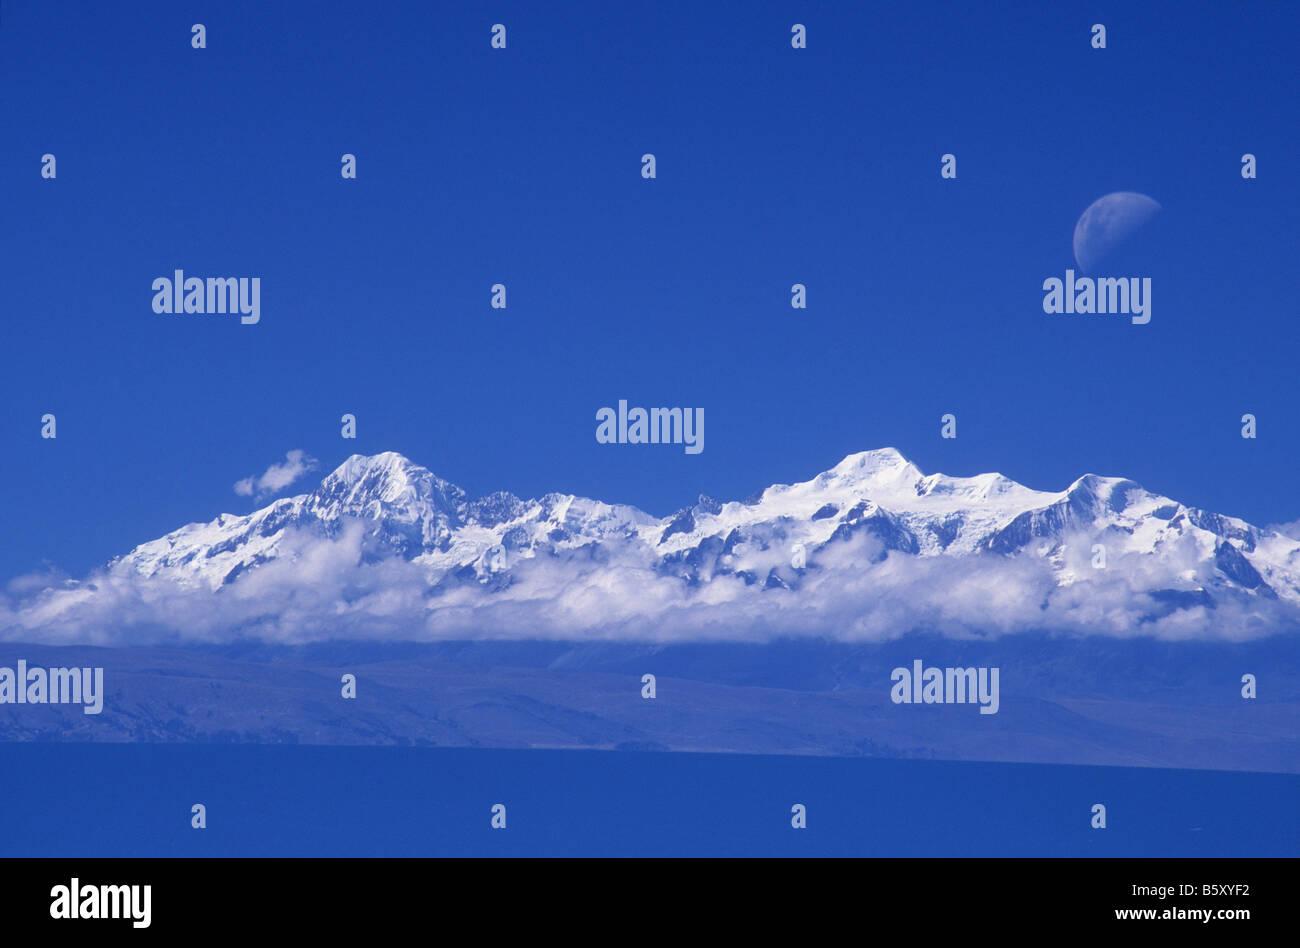 Moon rising over Mts Illampu (L), Ancohuma and Lake Titicaca, seen from Sun Island. Bolivia - Stock Image